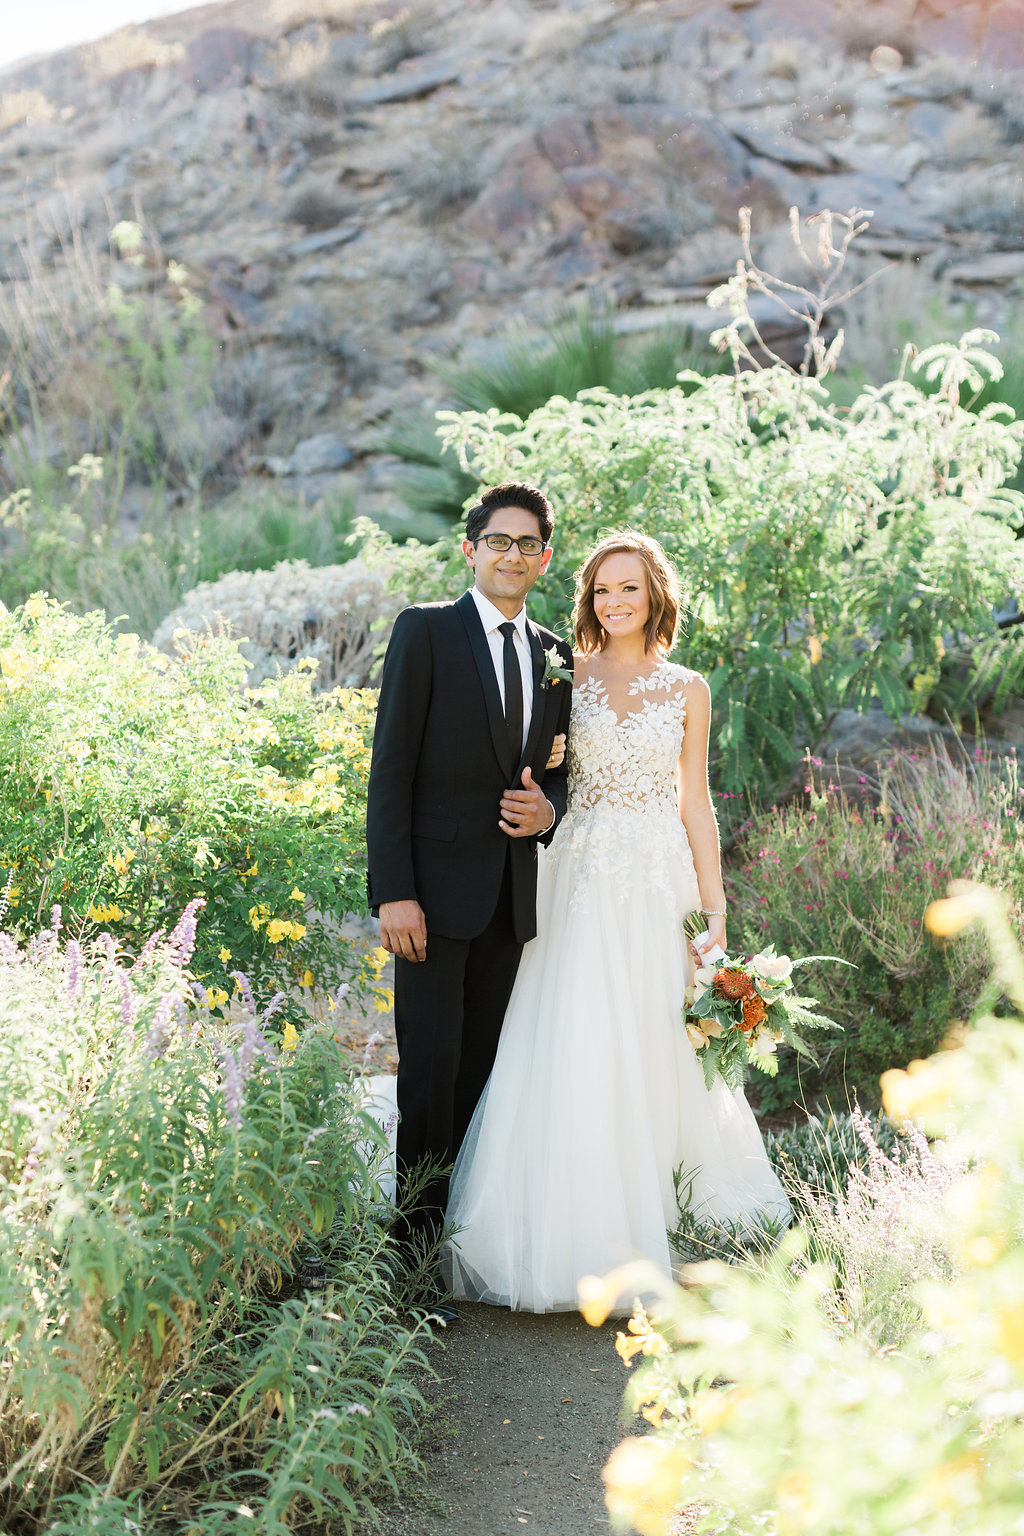 emily adhir wedding couple arm in arm